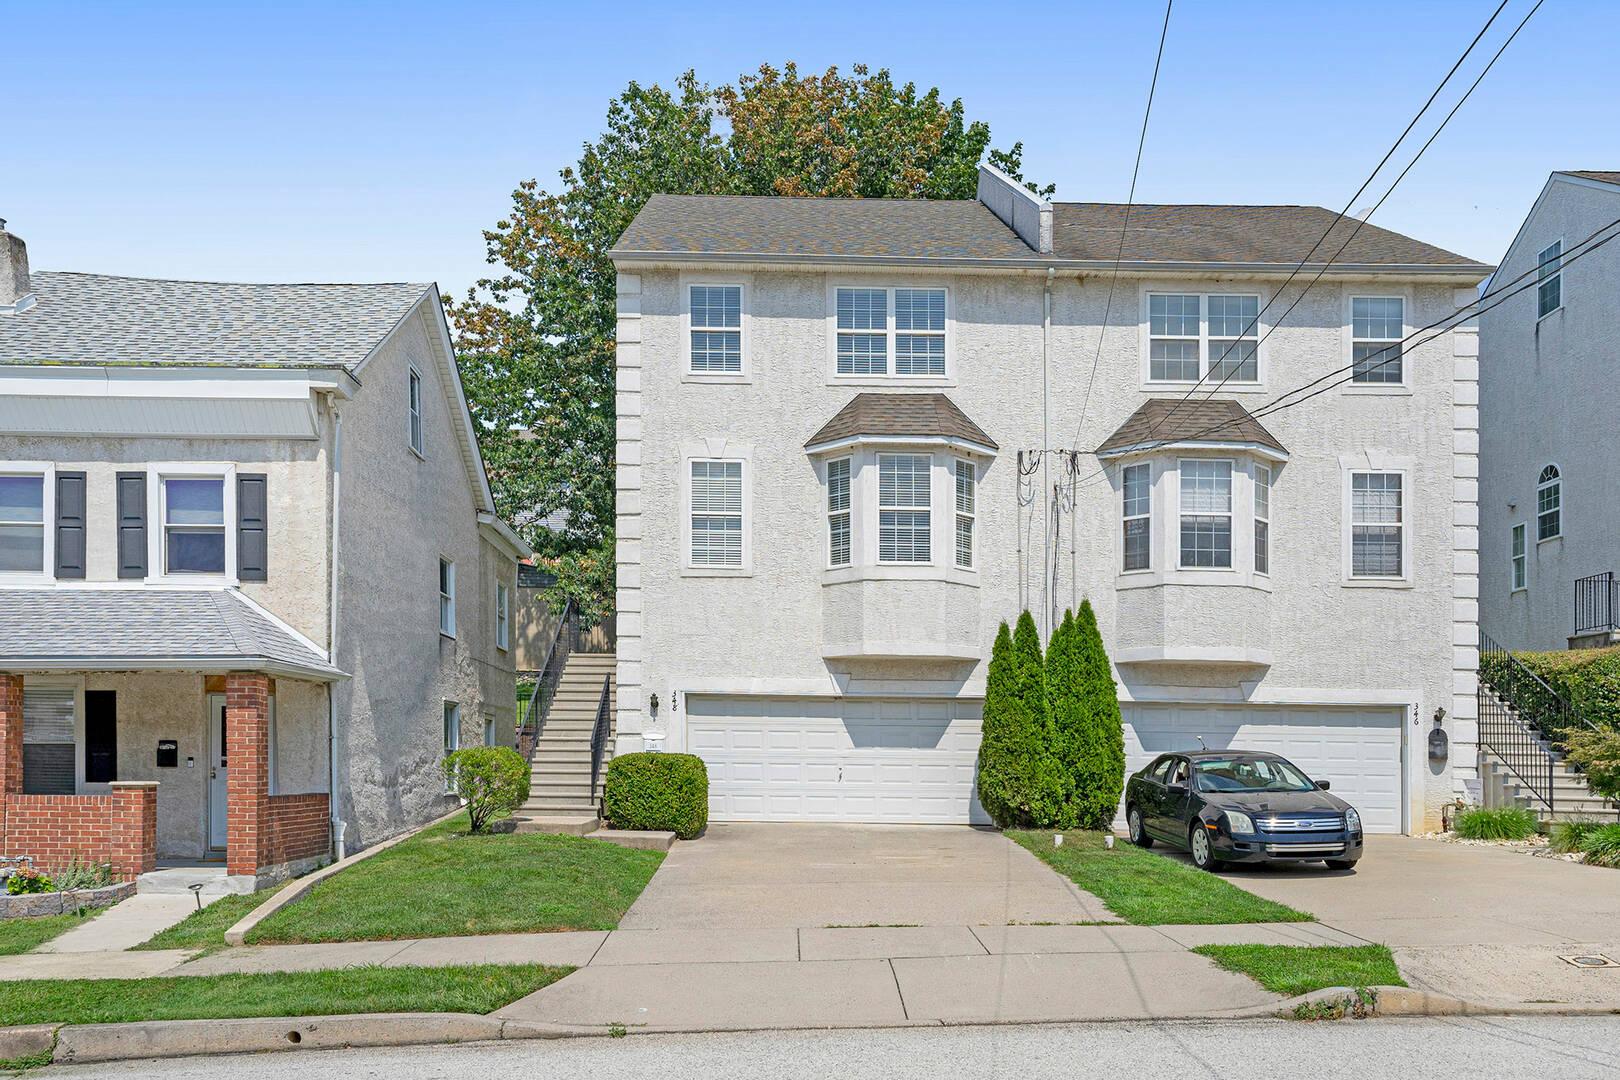 348 W 5th Ave Conshohocken, PA 19428